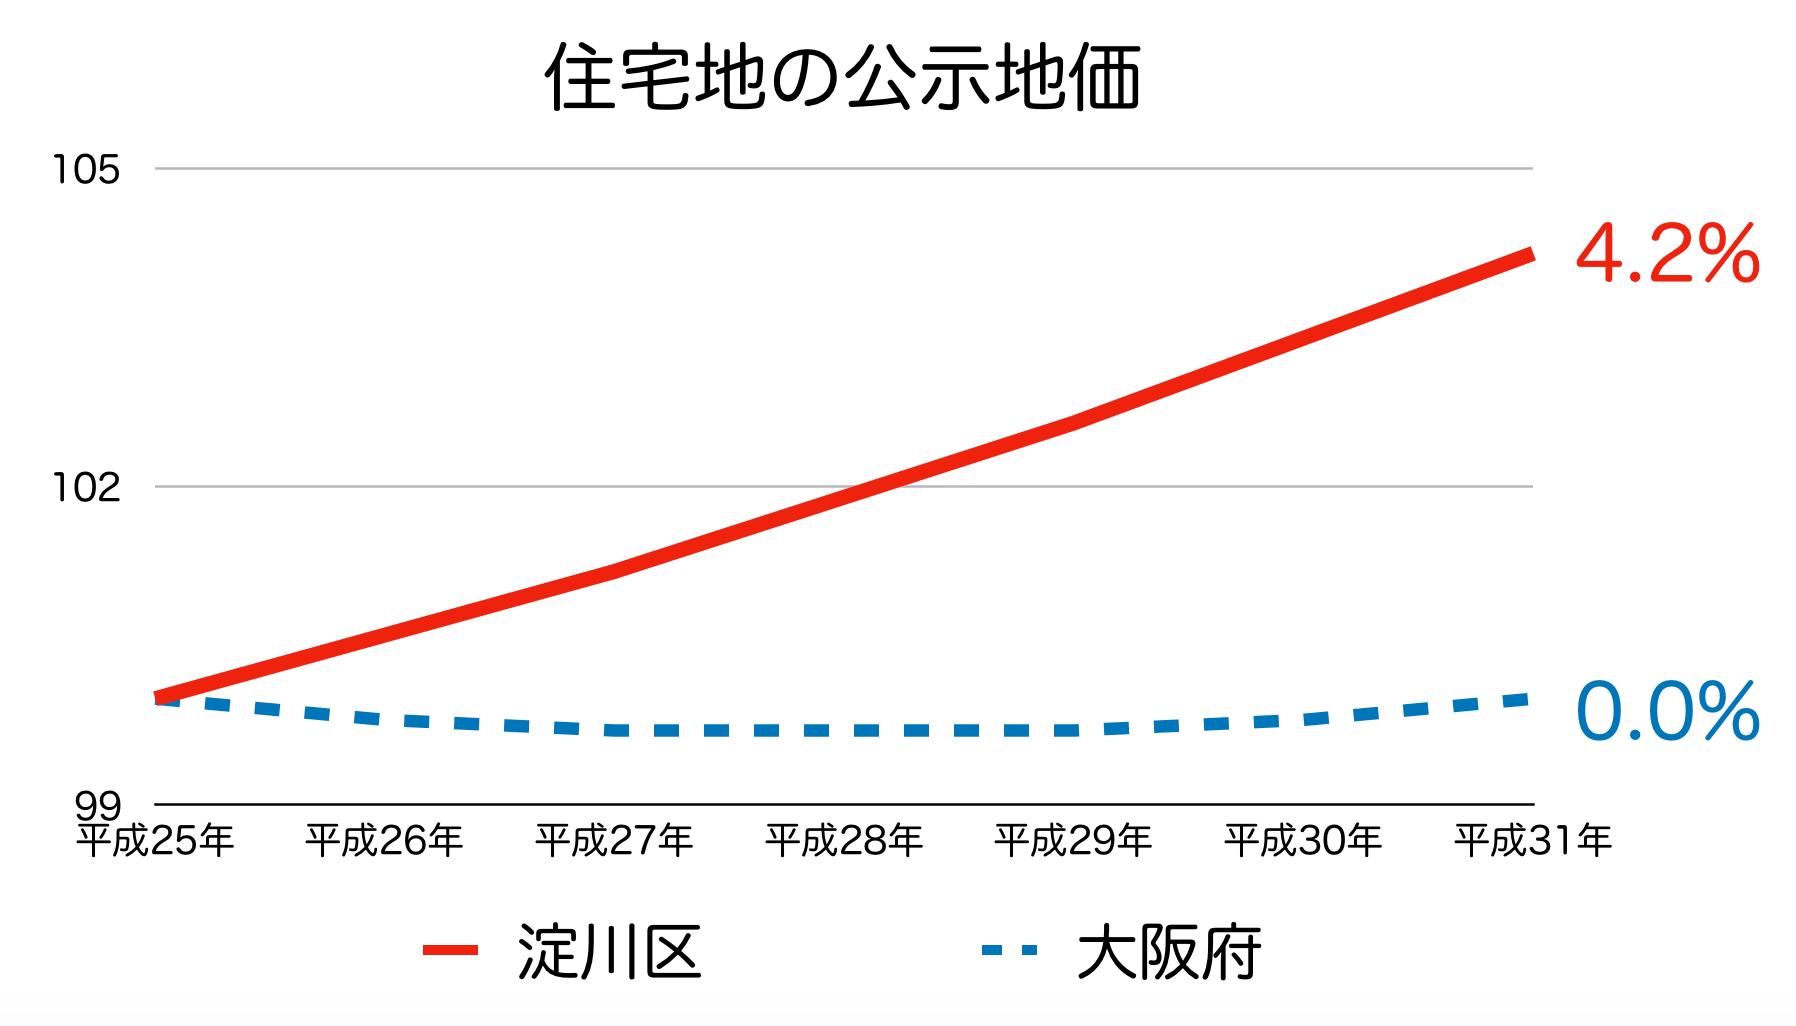 大阪市淀川区の公示地価 H25-H31